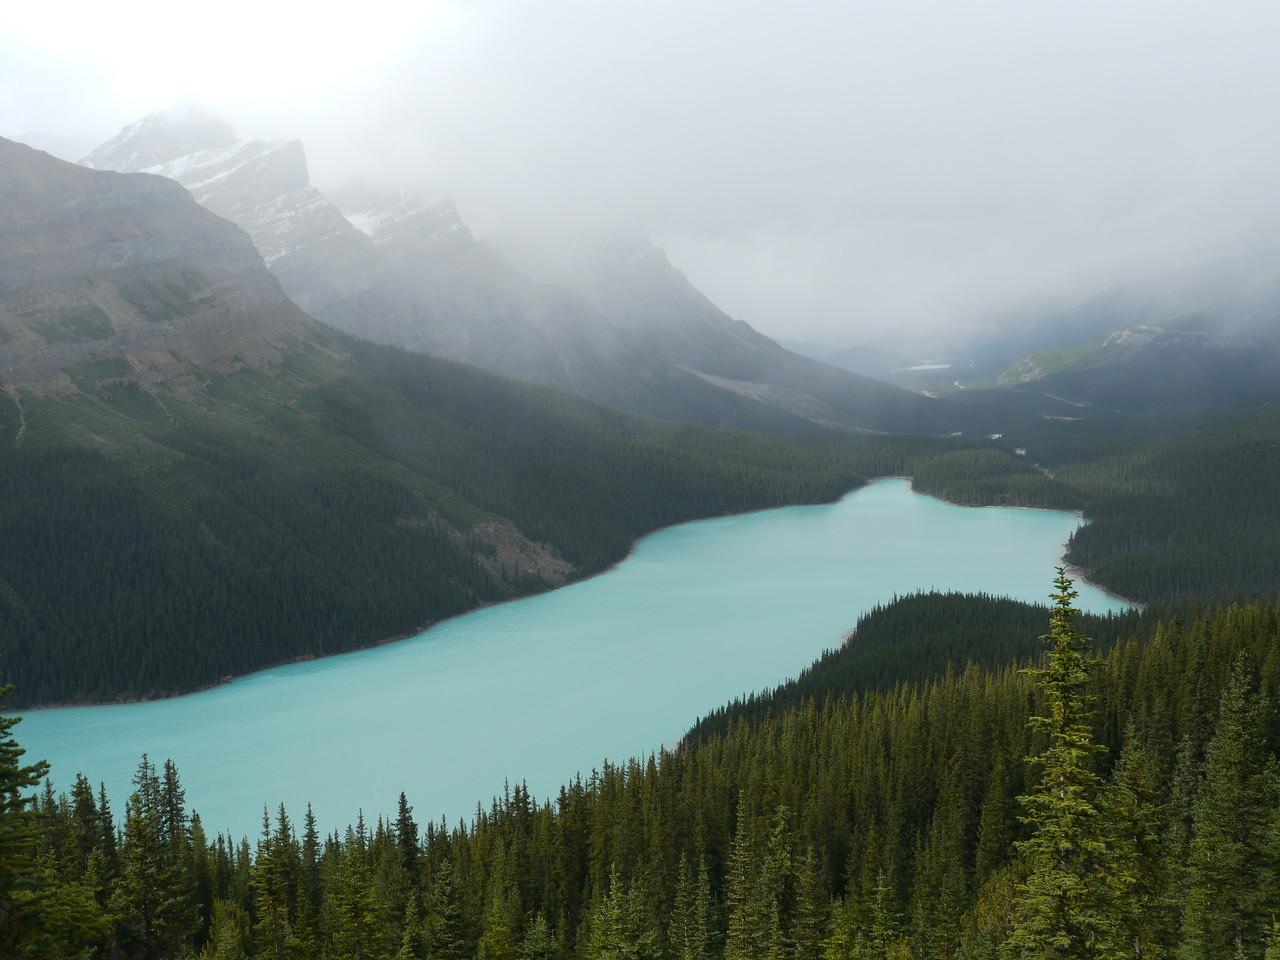 © RobAng 2009, Payto Lake (Bow Pass), Banff-/Jasper National Park - Icefields Parkway, 811 m.ü.M., Alberta, Kanada